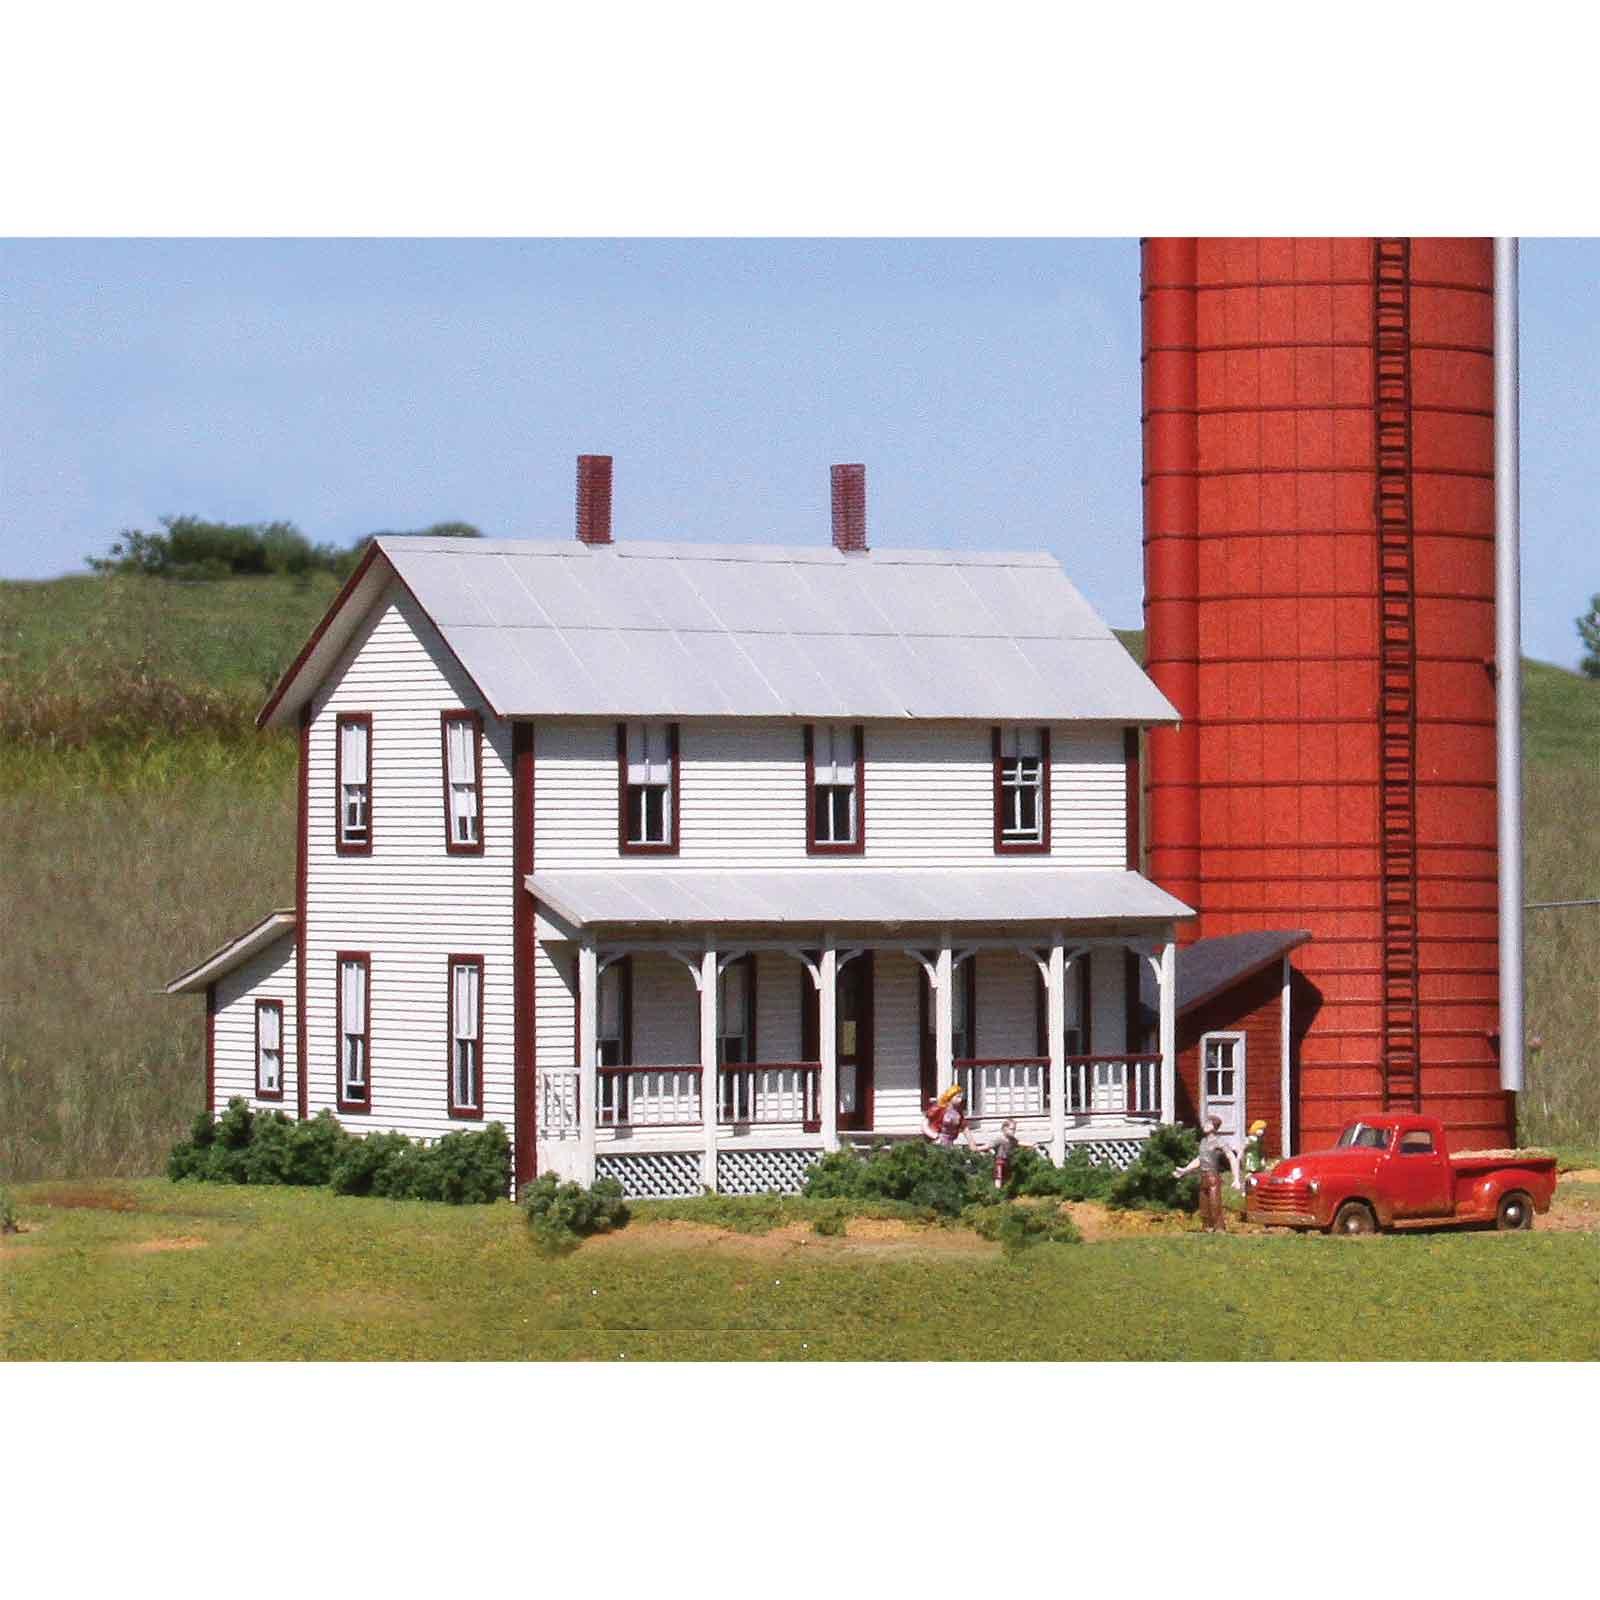 Laserkit two story farmhouse kit ho scale for Farmhouse building kits